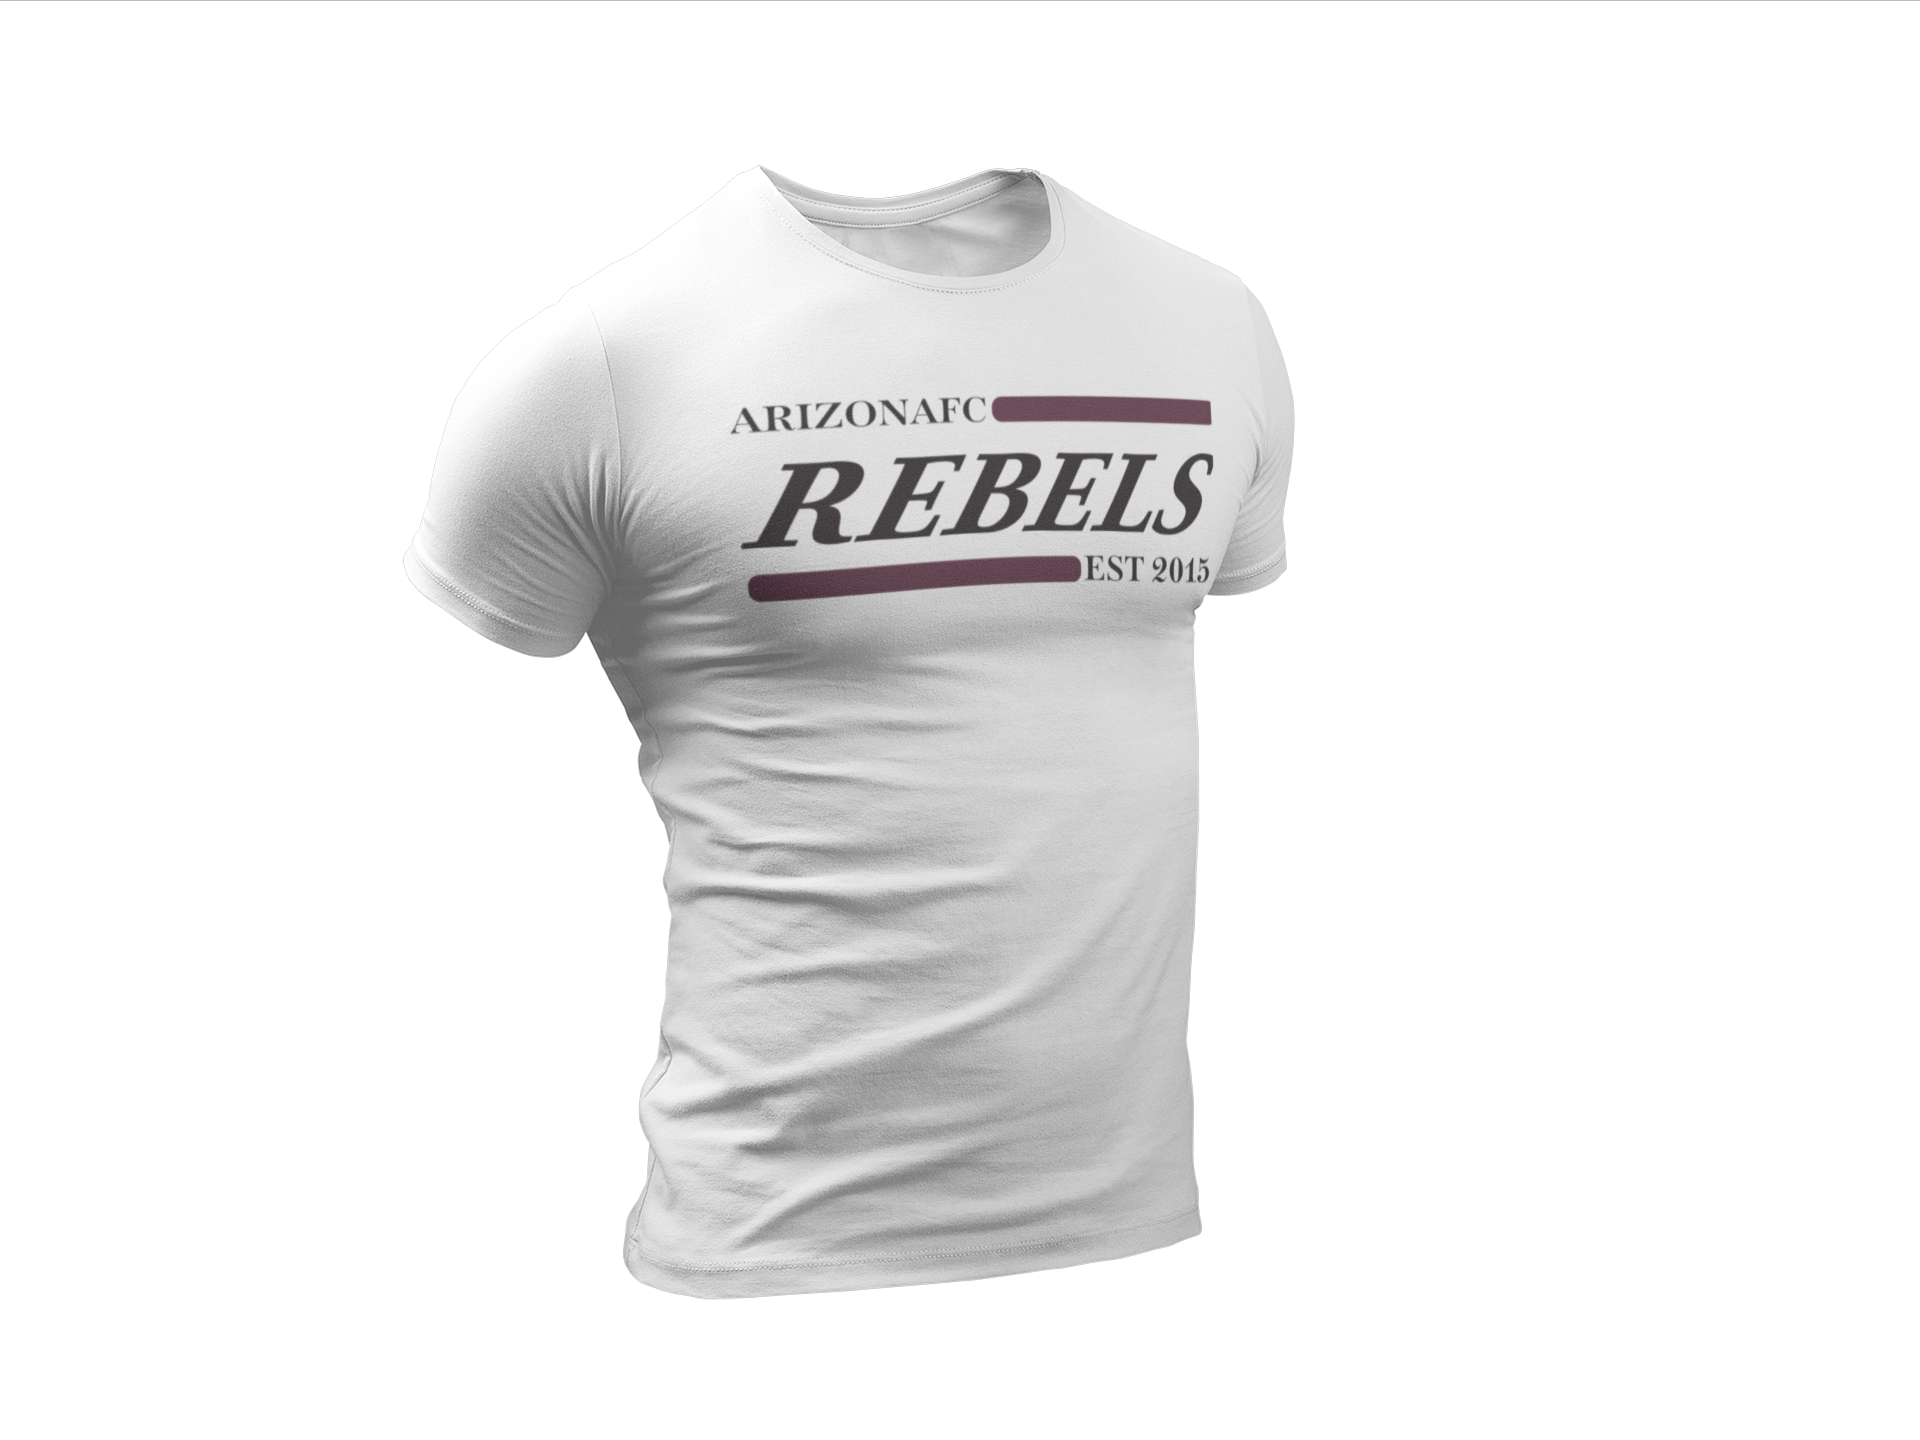 Arizona FC Rebels 00002